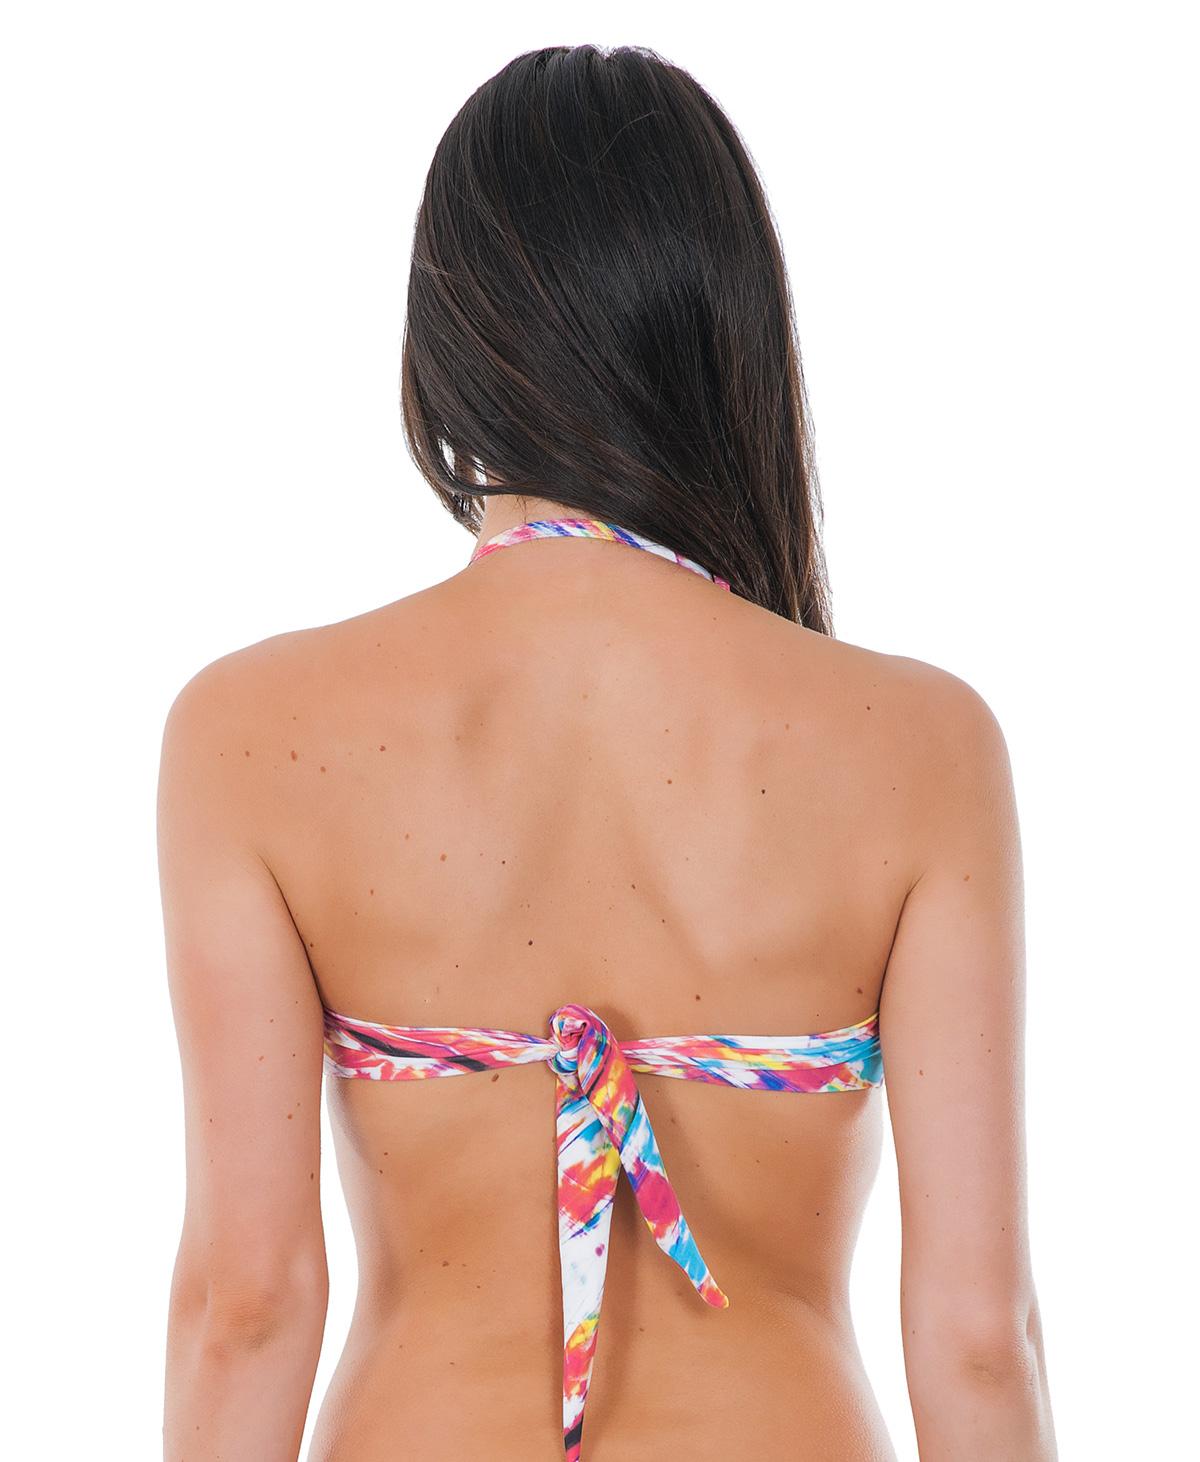 ... Bandeau-Bikinioberteil in Tie-and-Dye, mit Bügeln - SOUTIEN TIE DYE